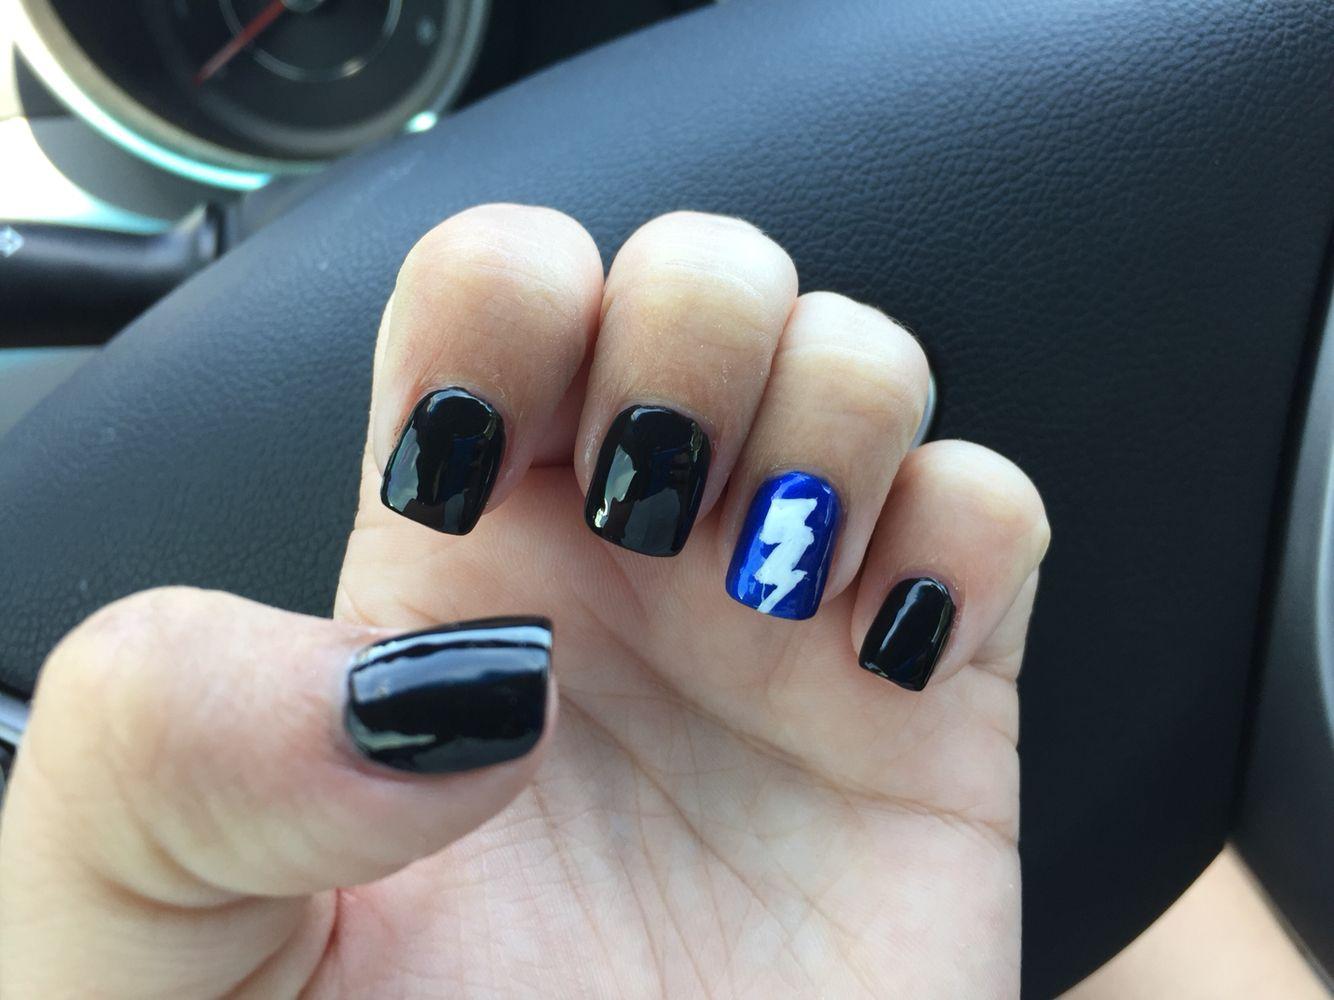 Tampa bay lightning nails | Tampa bay Lightning | Pinterest ...